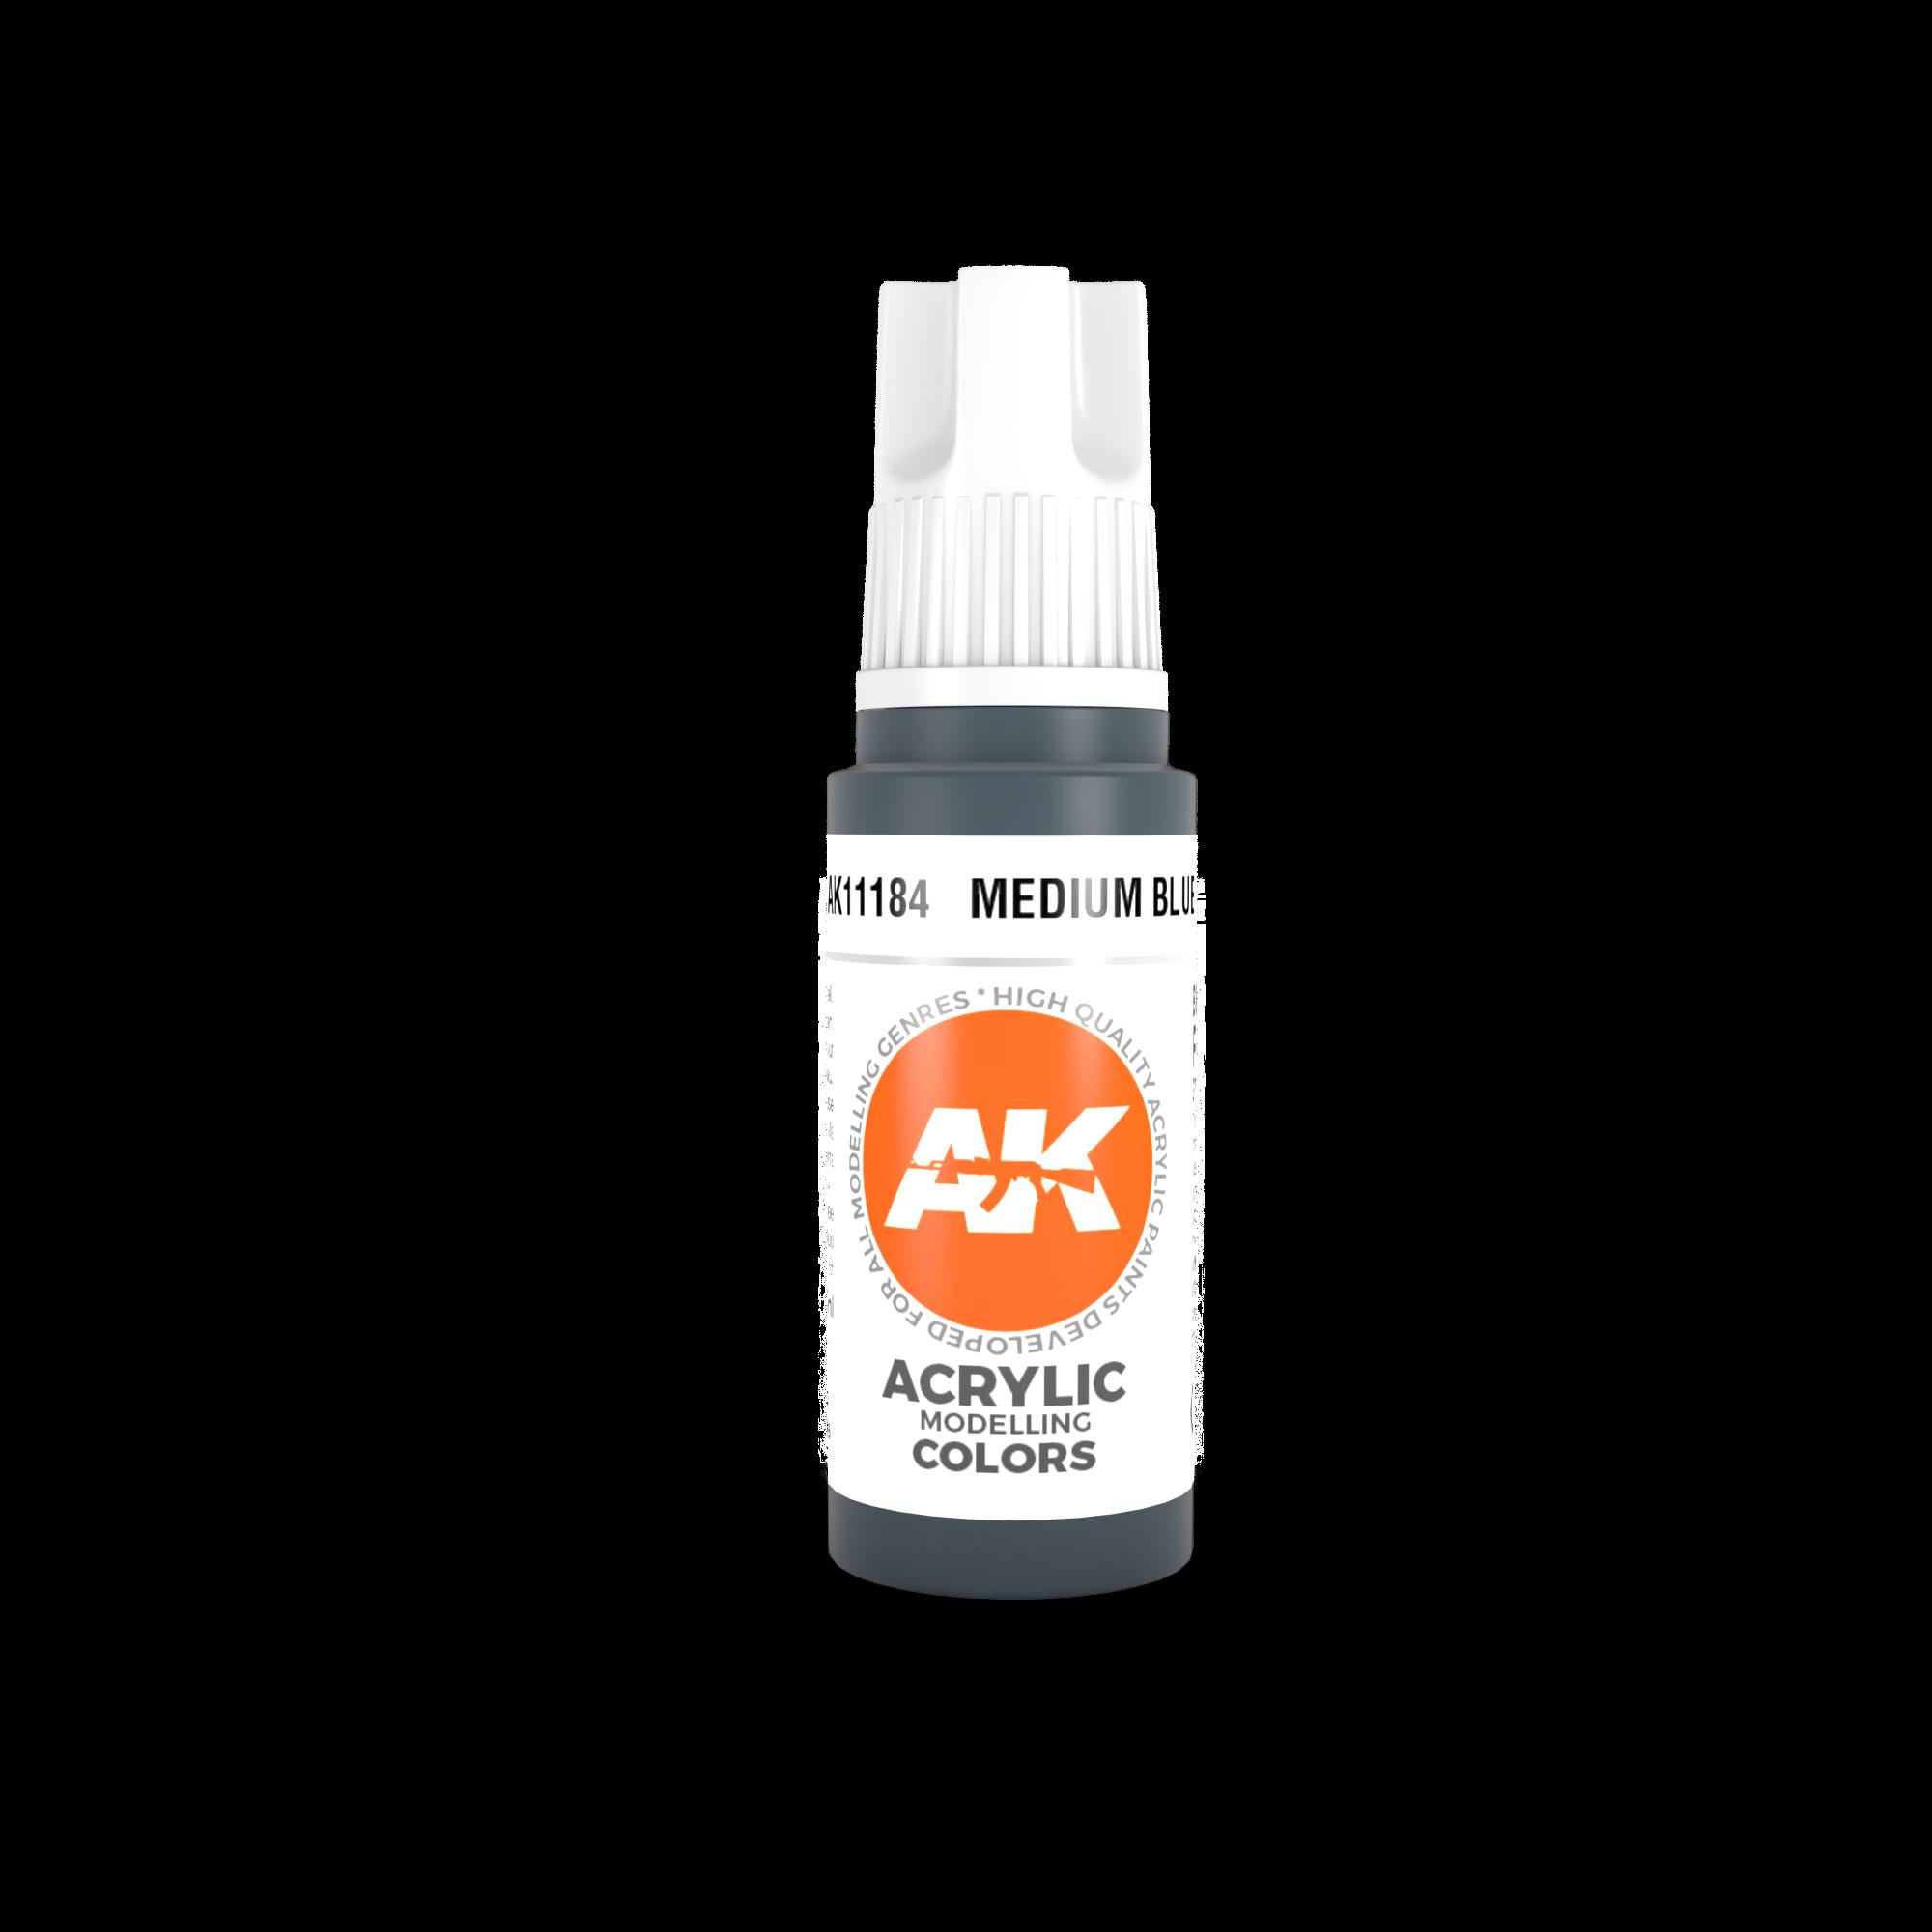 AK-Interactive Medium Blue Acrylic Modelling Color - 17ml - AK-11184